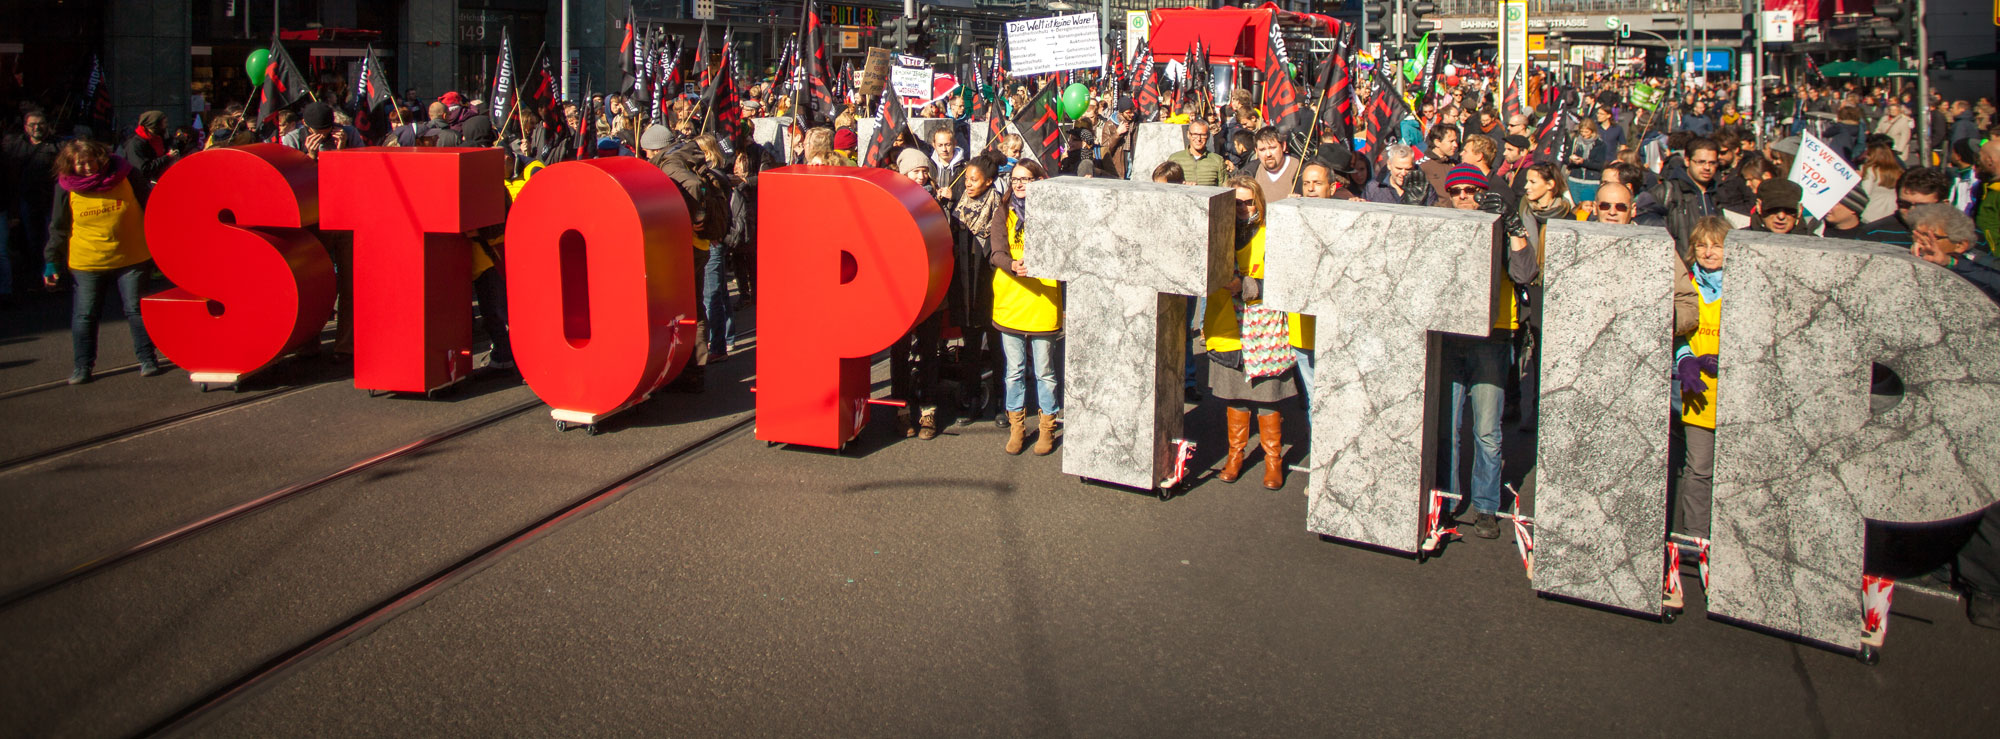 TTIP-Berlin-1